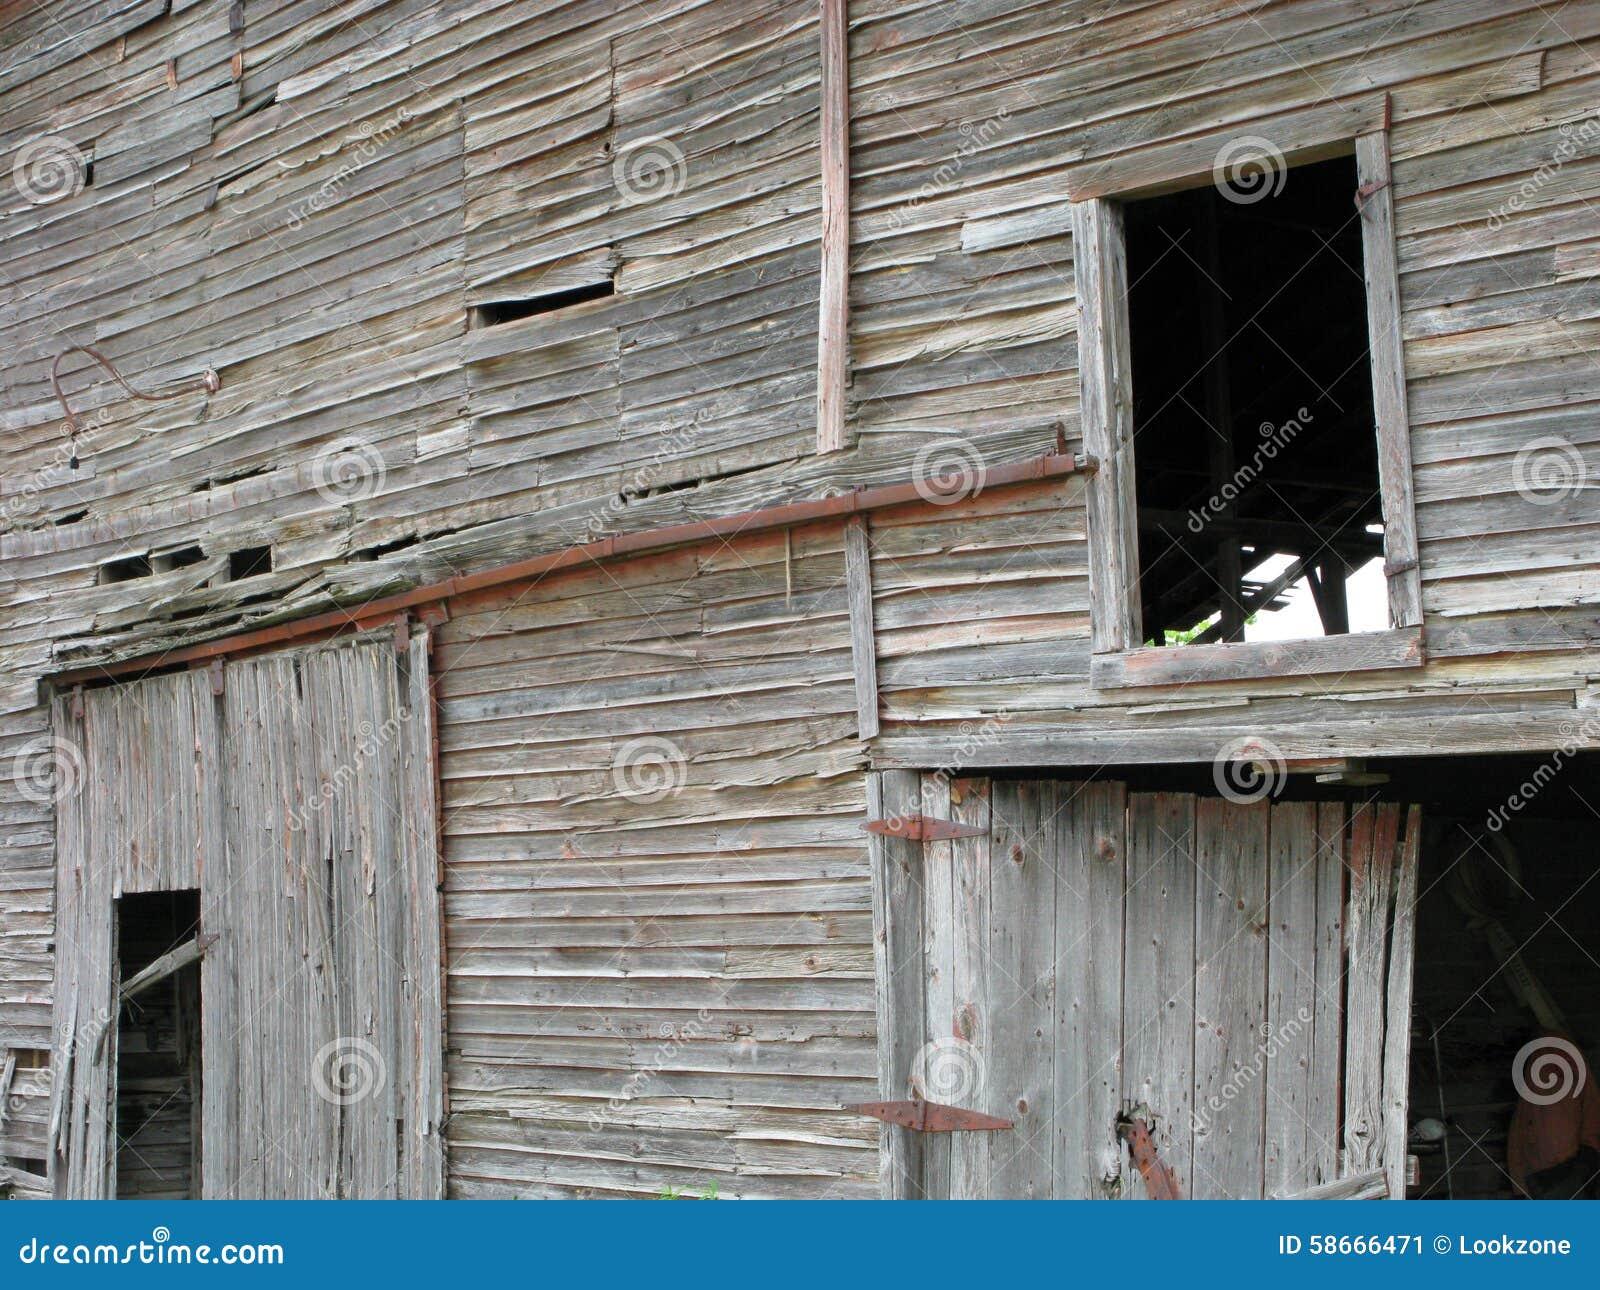 paneling custom barn wood bar products woodhaven siding barns